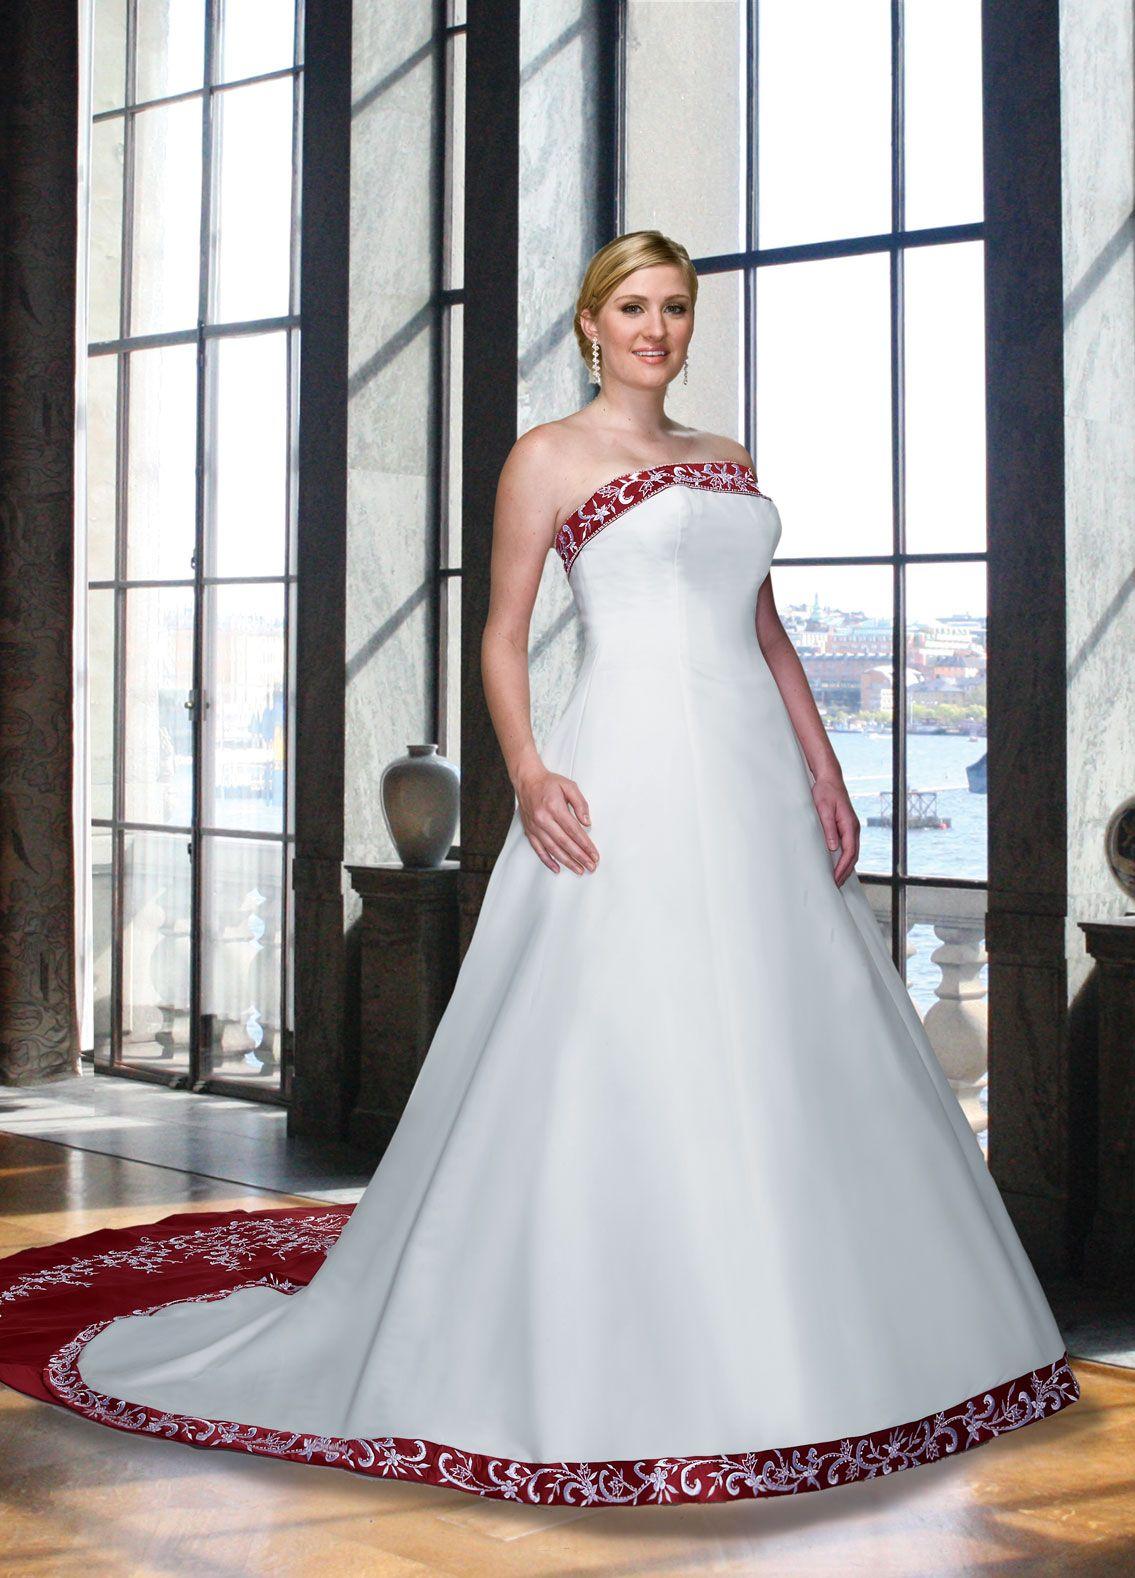 Da Vinci Wedding Gowns Full Figured Style 8229 Full Figured Fabric Satin Color Ivory Ivory Full Figure Wedding Dress Scoop Wedding Dress Wedding Dresses [ 1578 x 1135 Pixel ]